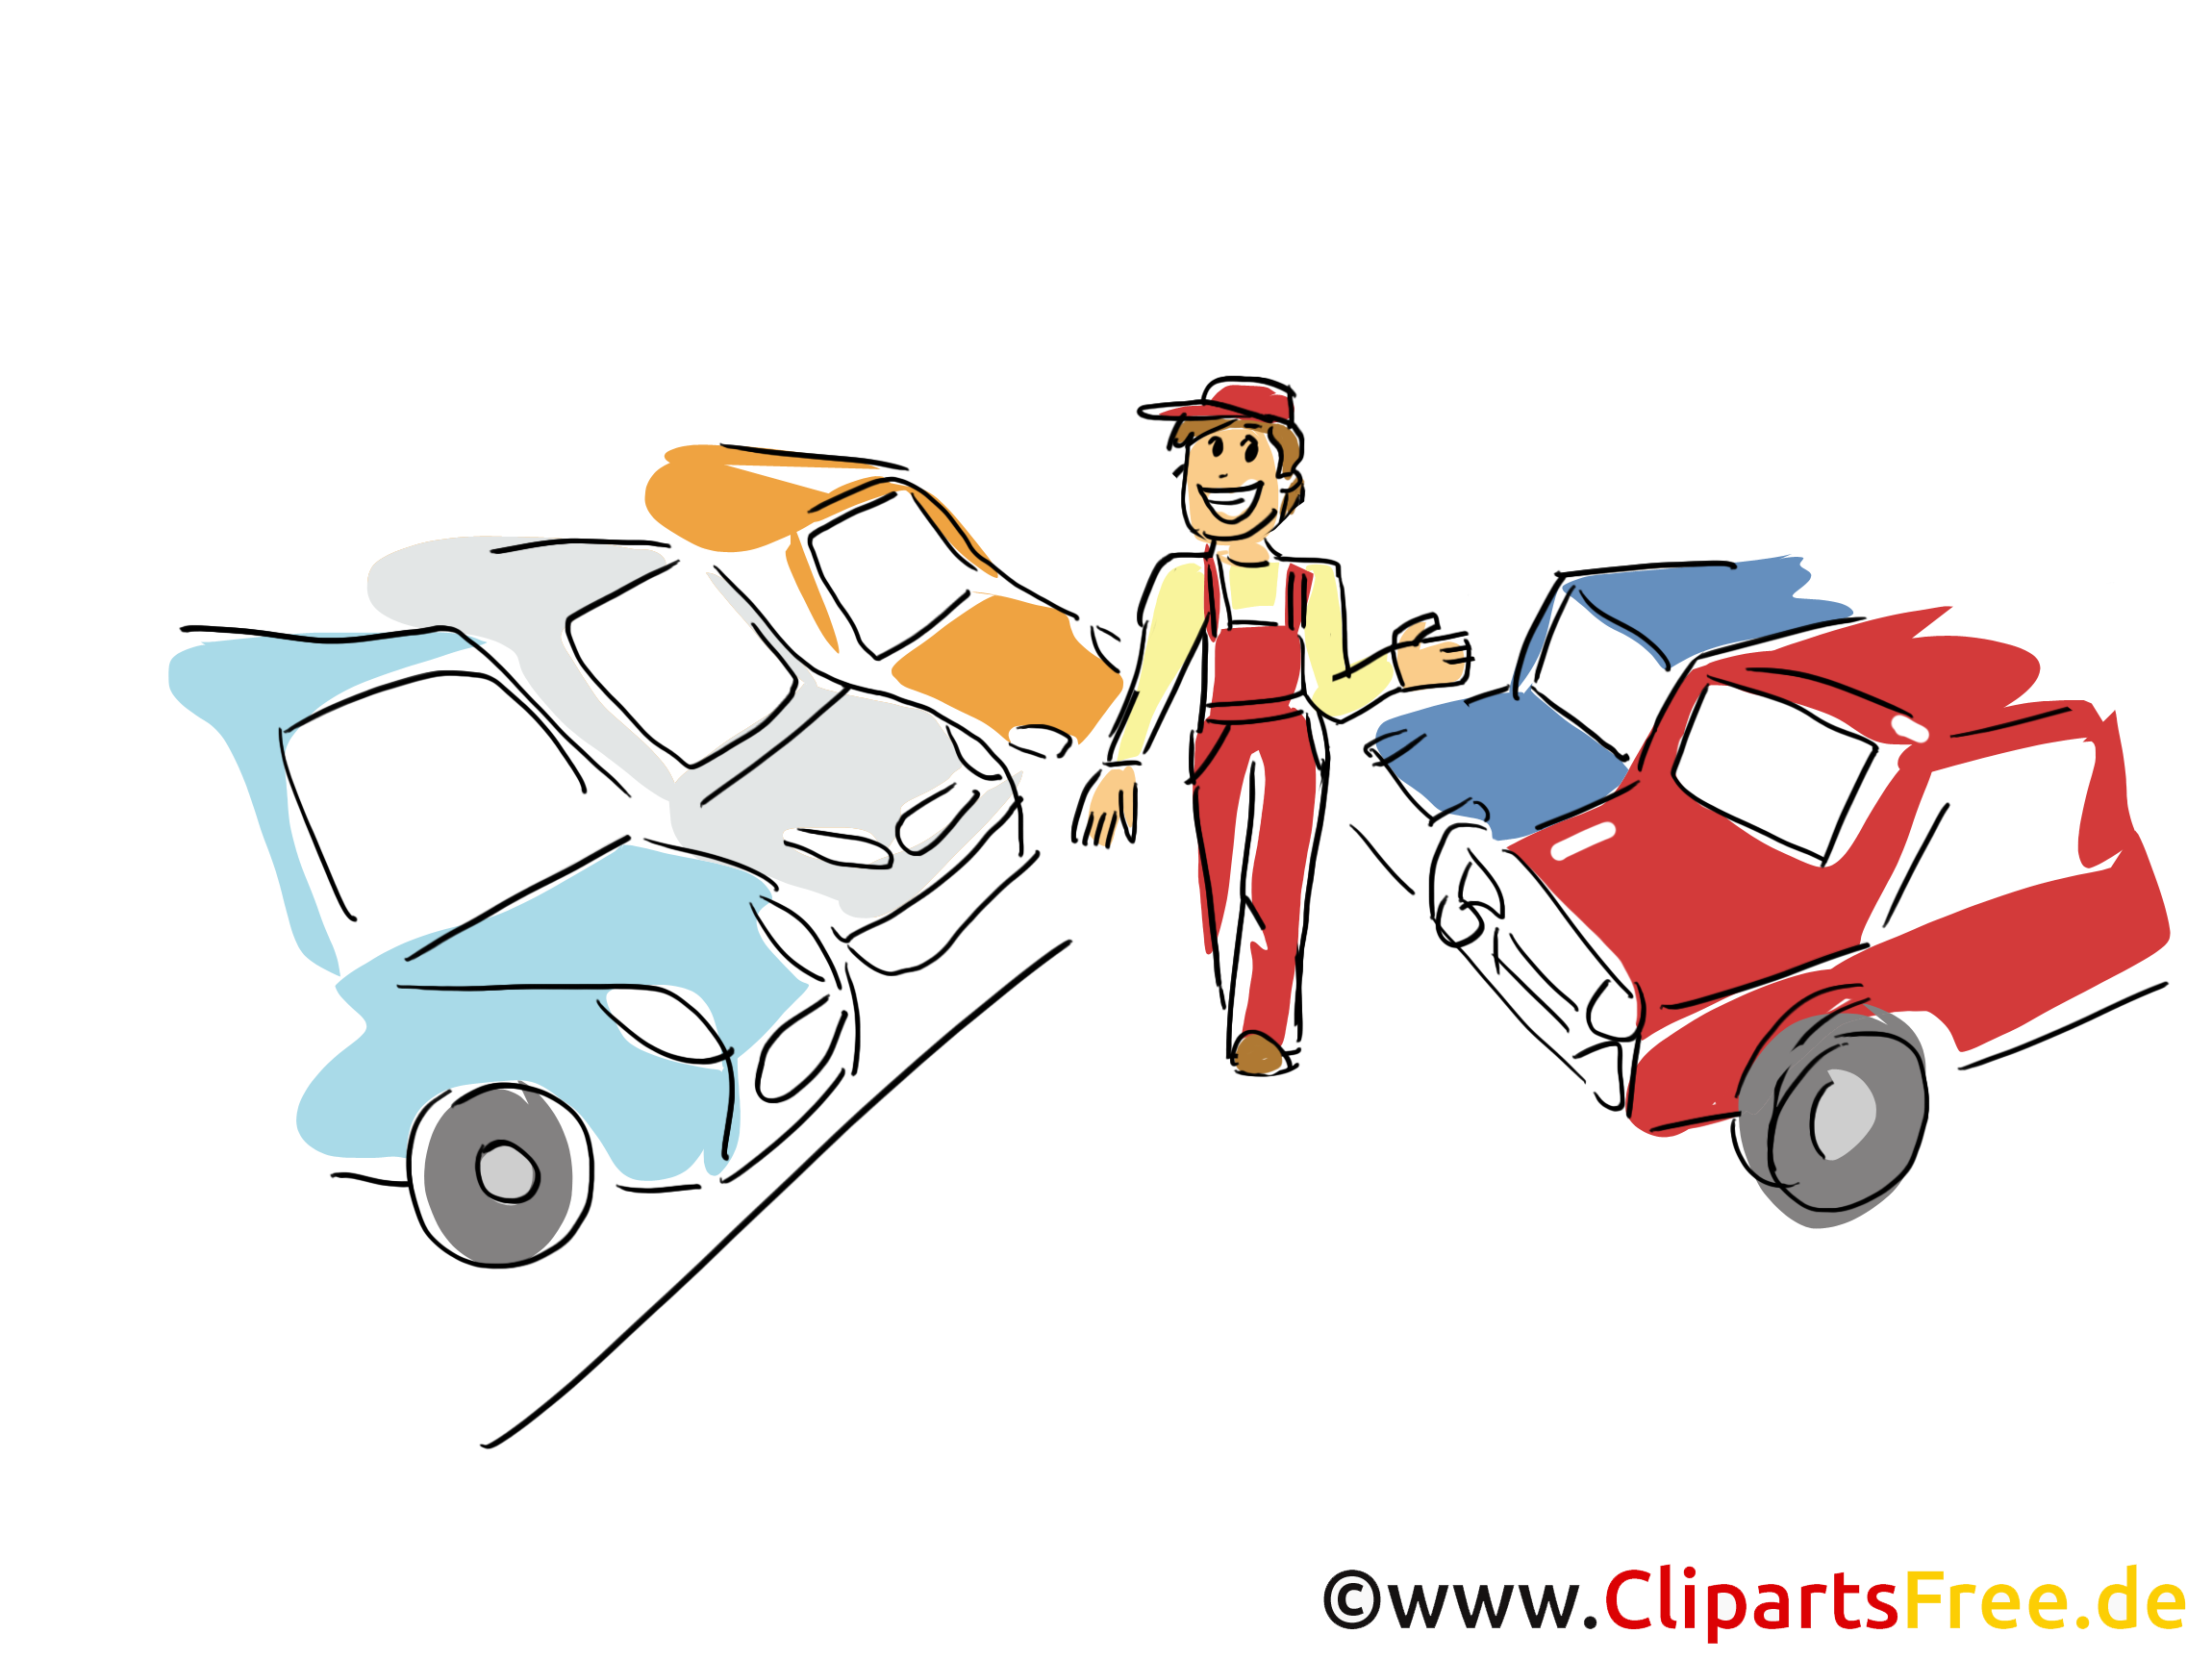 Autohaus Clipart, Bild, Grafik, Cartoon, Illustration gratis